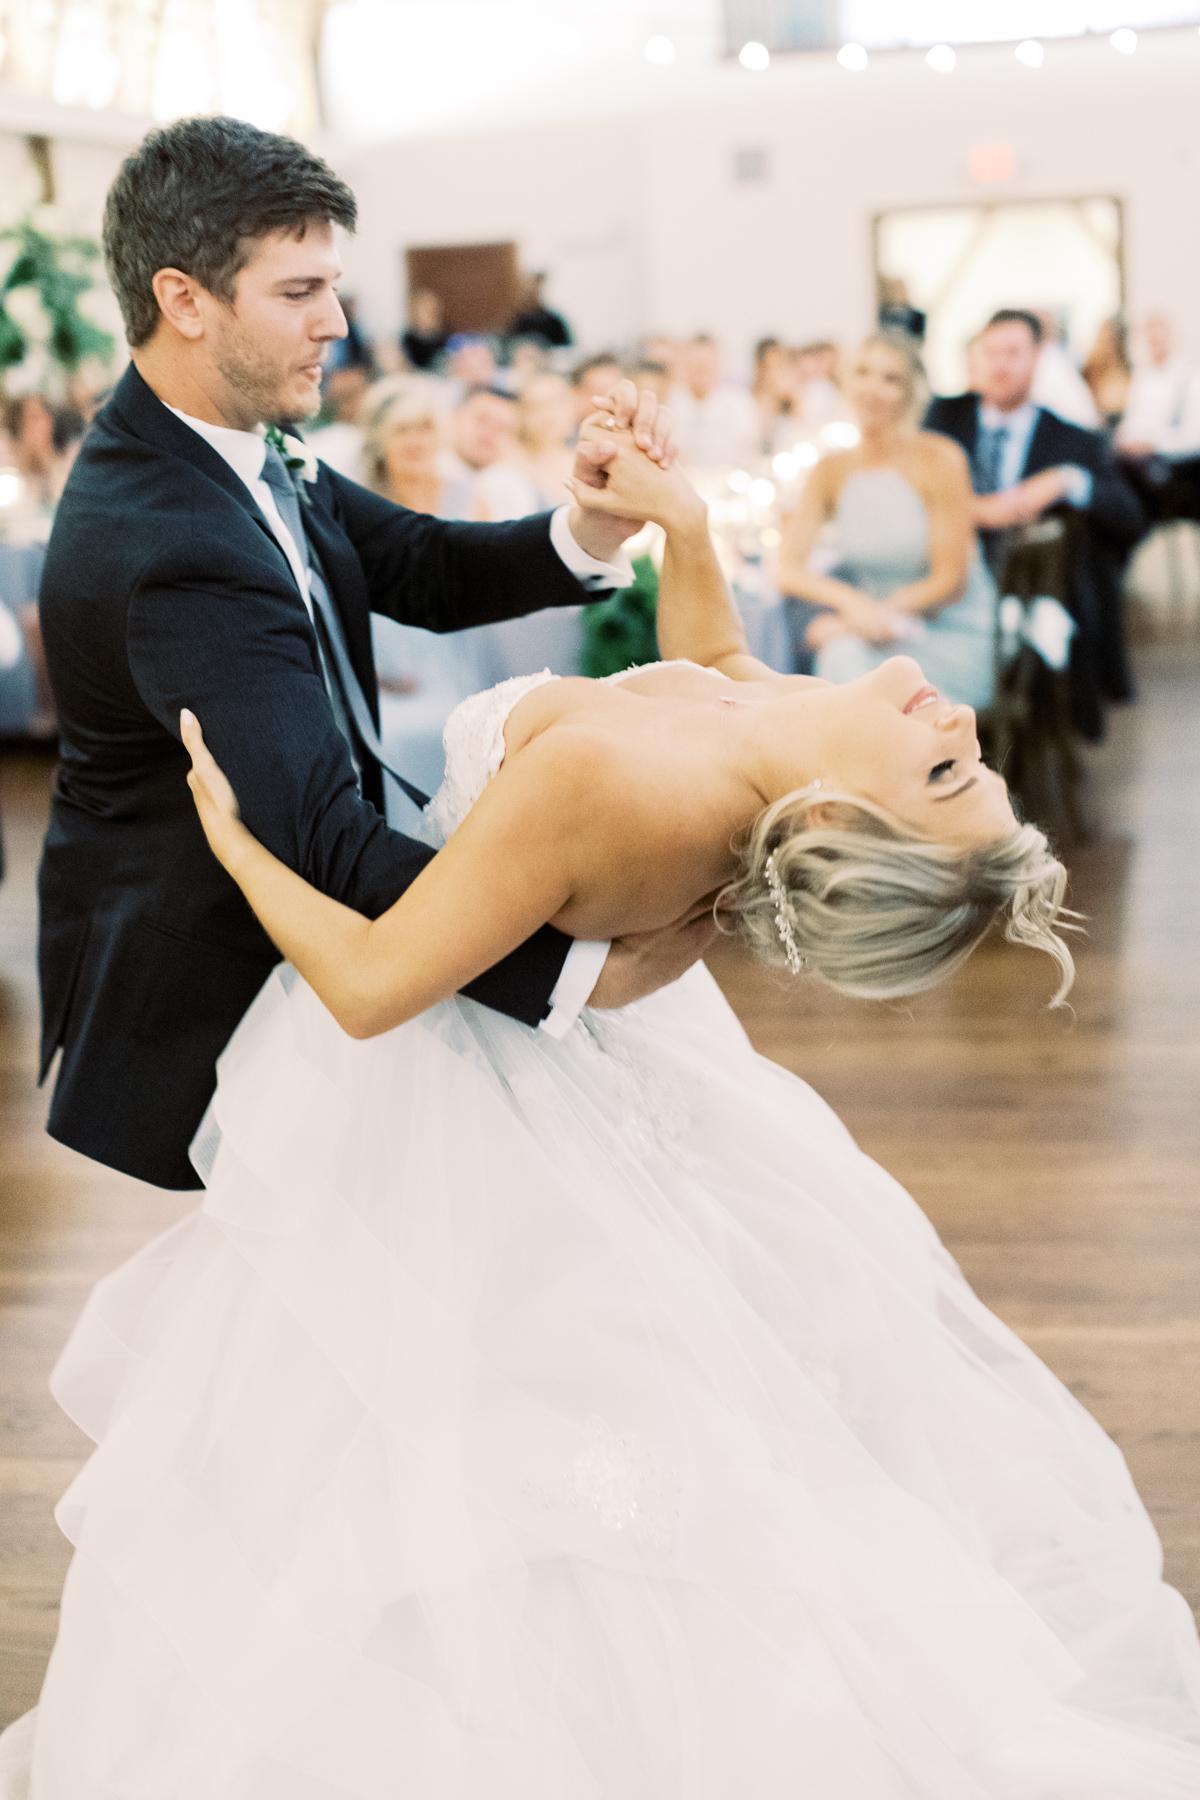 winmock-kinderton-wedding-077.jpg